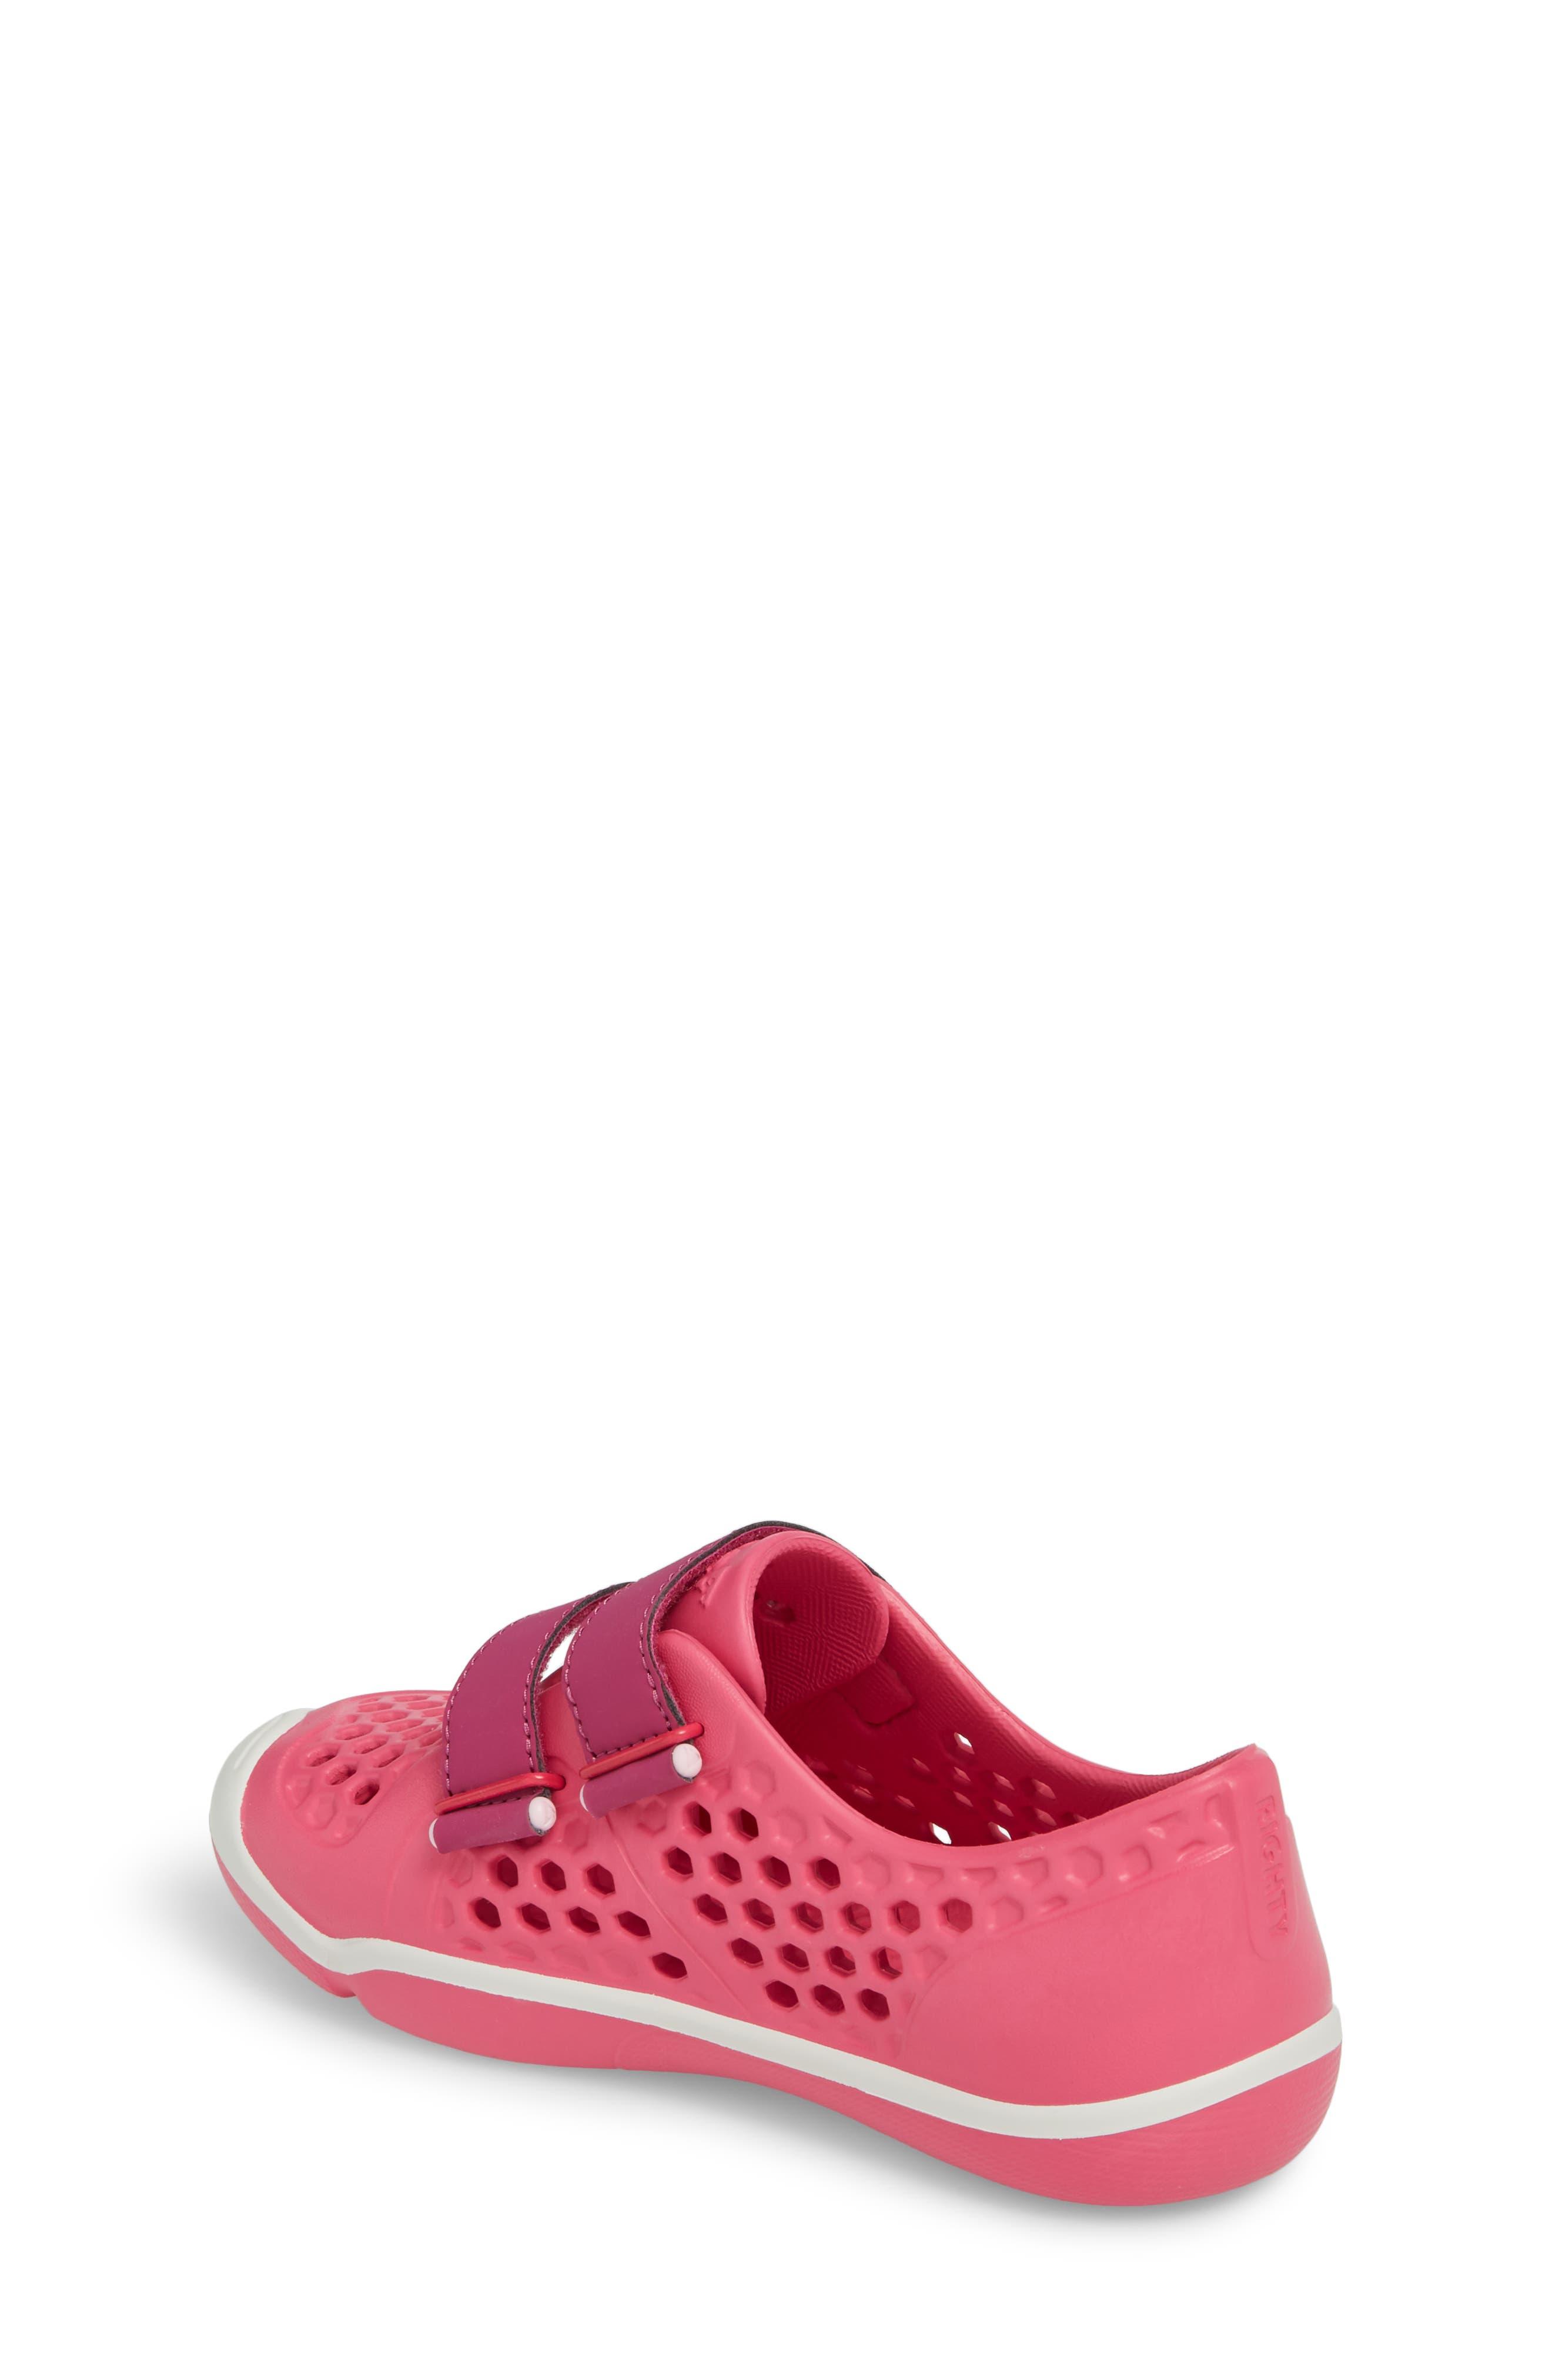 Alternate Image 2  - PLAE Mimo Customizable Sneaker (Toddler & Little Kid)